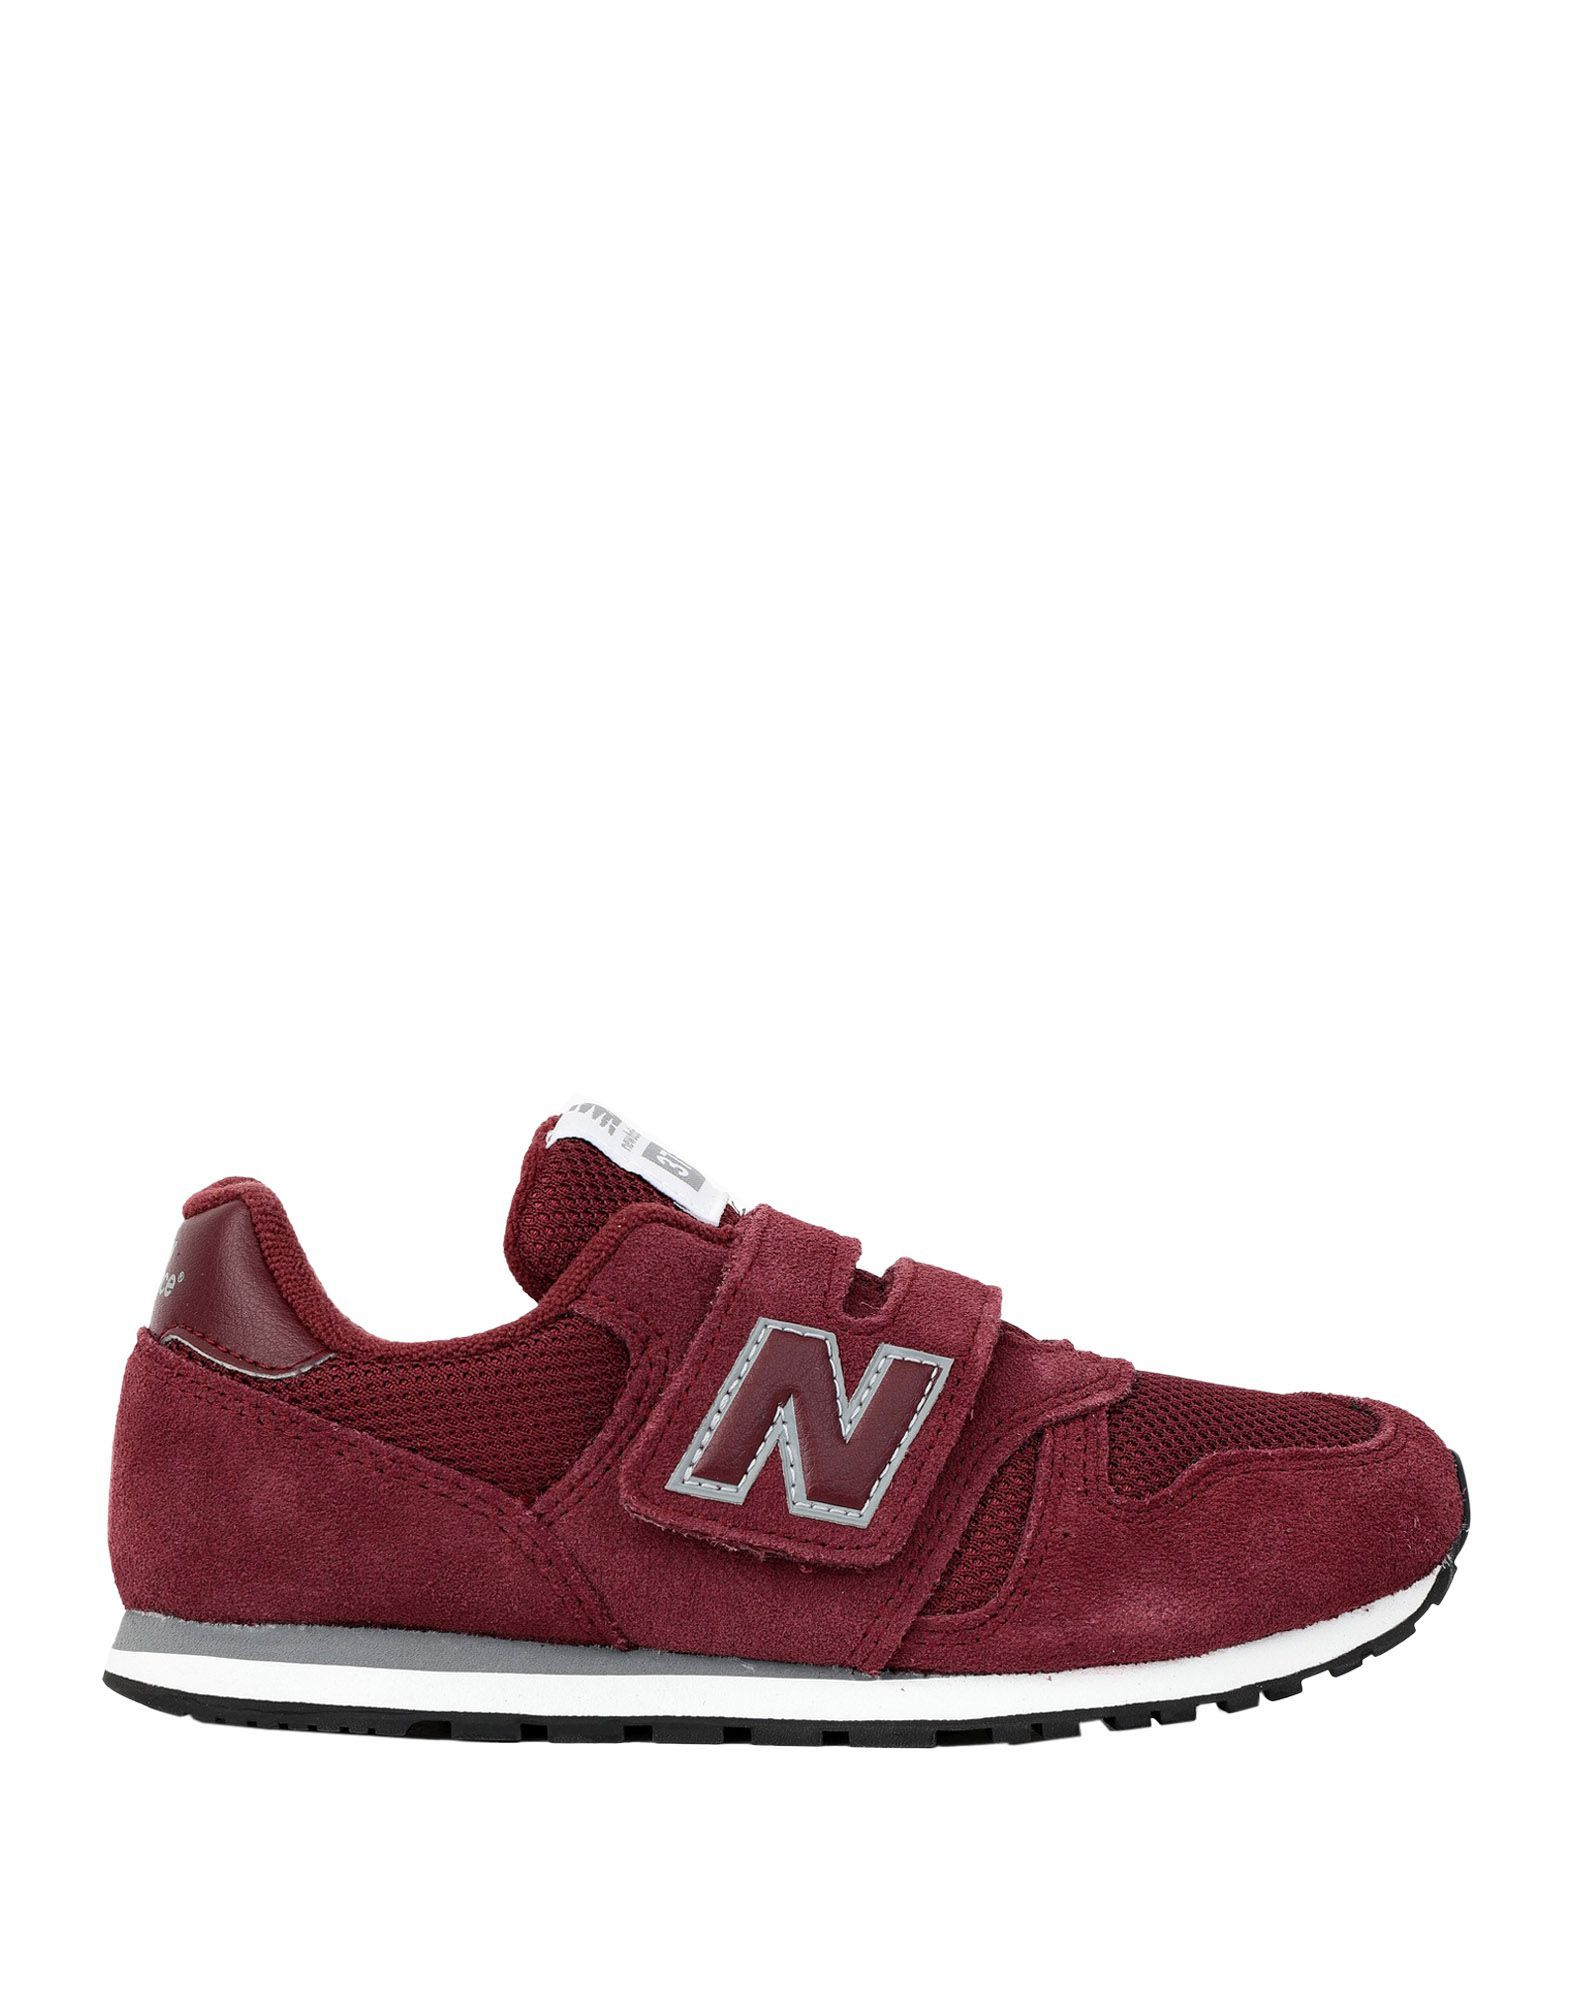 FOOTWEAR New Balance Maroon Unisex Leather